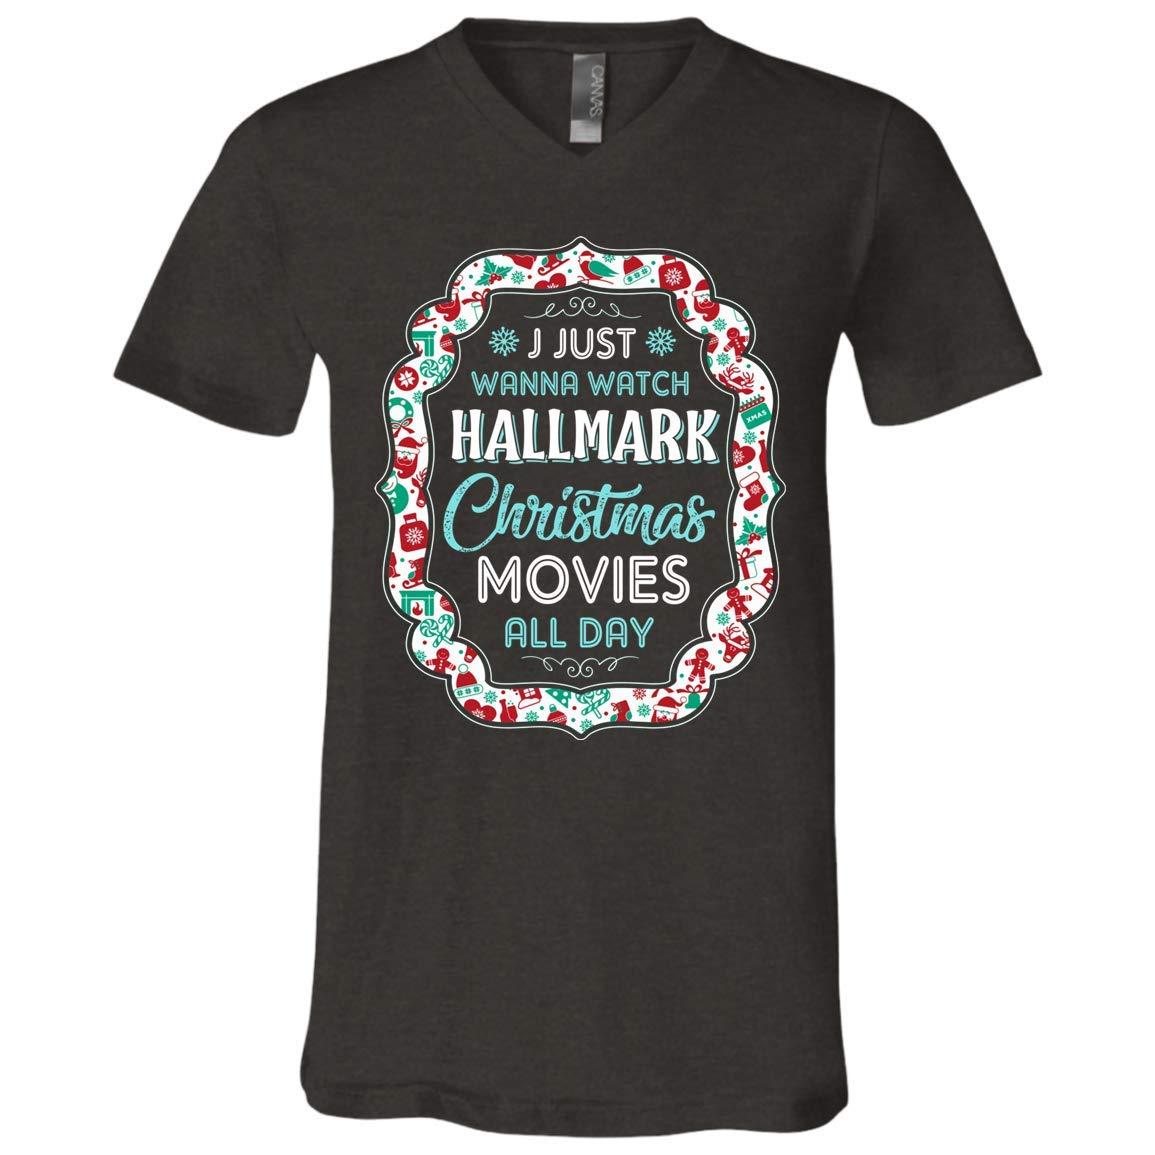 Hallmark Christmas Shirt.I Just Wanna Watch Hallmark Christmas Movies All Day T Shirt Christmas Movies Fans T Shirt